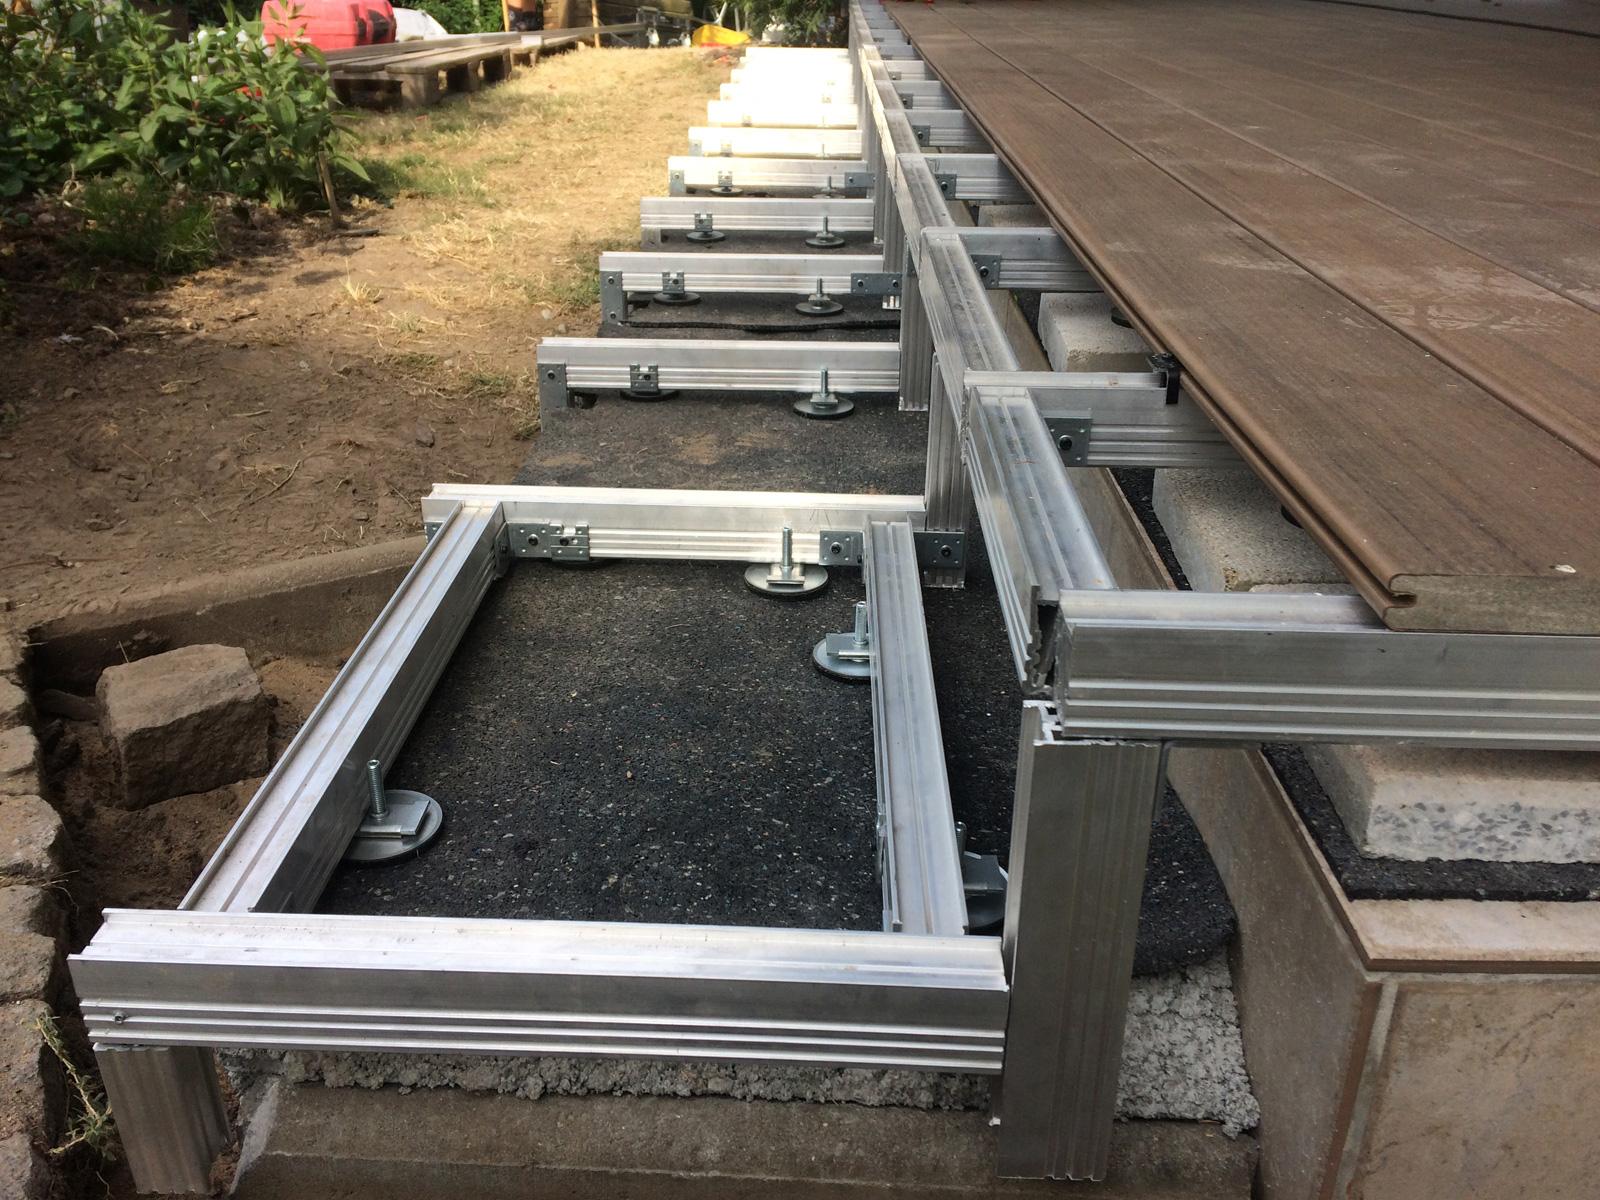 gartenmanufaktur-nuessler-baustelle-terrasse-aluminium-unterkonstruktion